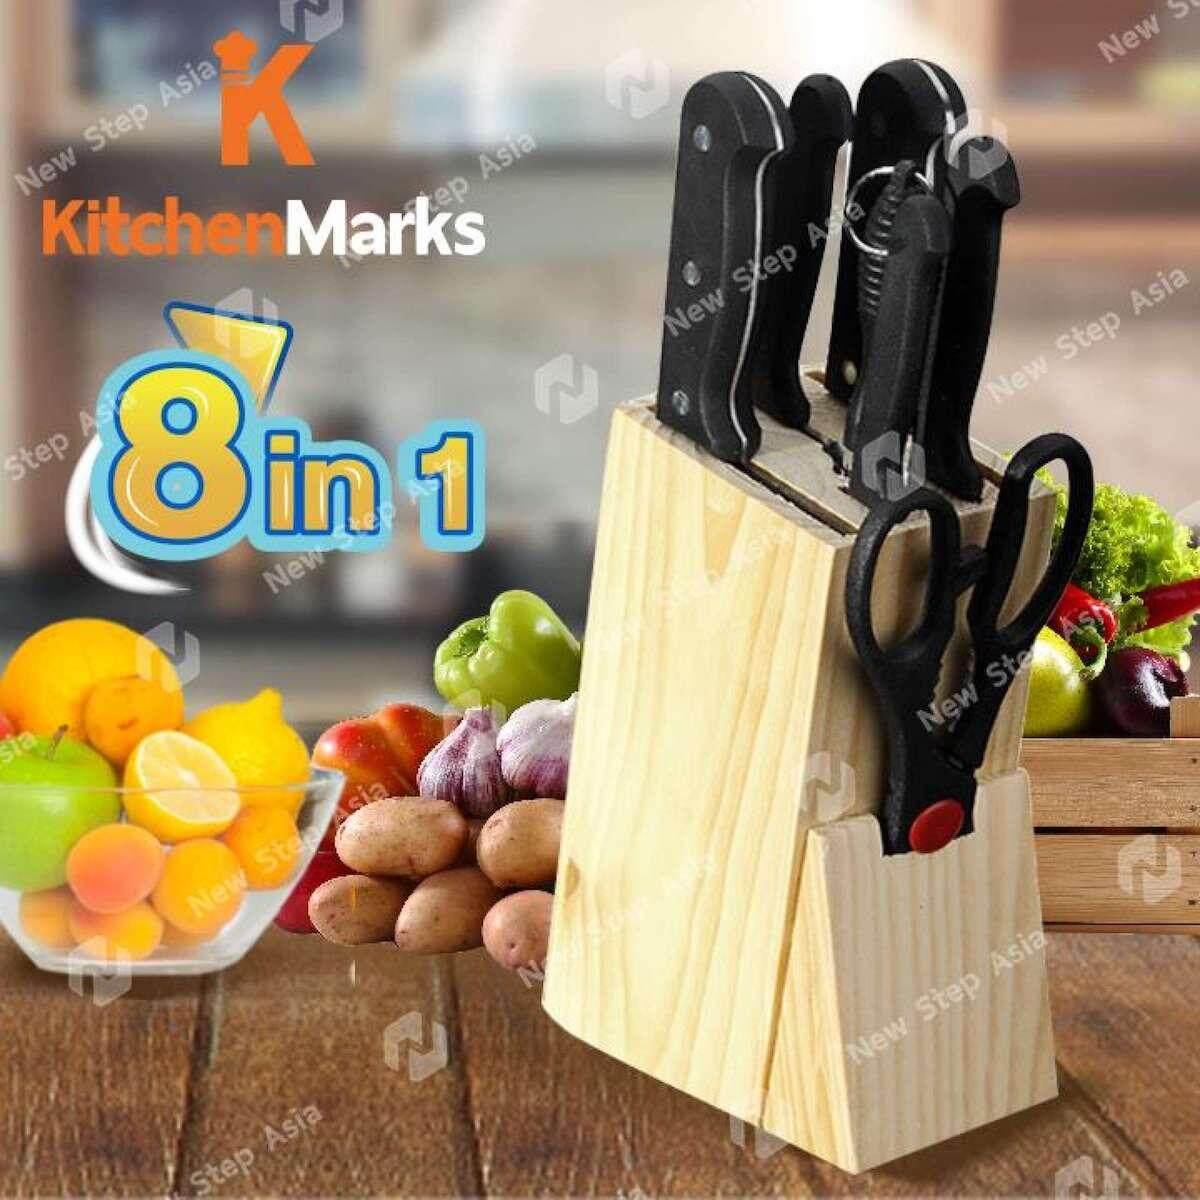 KitchenMarks ชุดมีด 7 ชิ้น พร้อมกล่องไม้ ที่เสียบมีด ชุดมีดอเนกประสงค์ อุปกรณ์ทำครัว ชุดเครื่องครัว มีด มีดทำครัว chef's knife cleaver fillet knife scissors knife sharpener new step asia